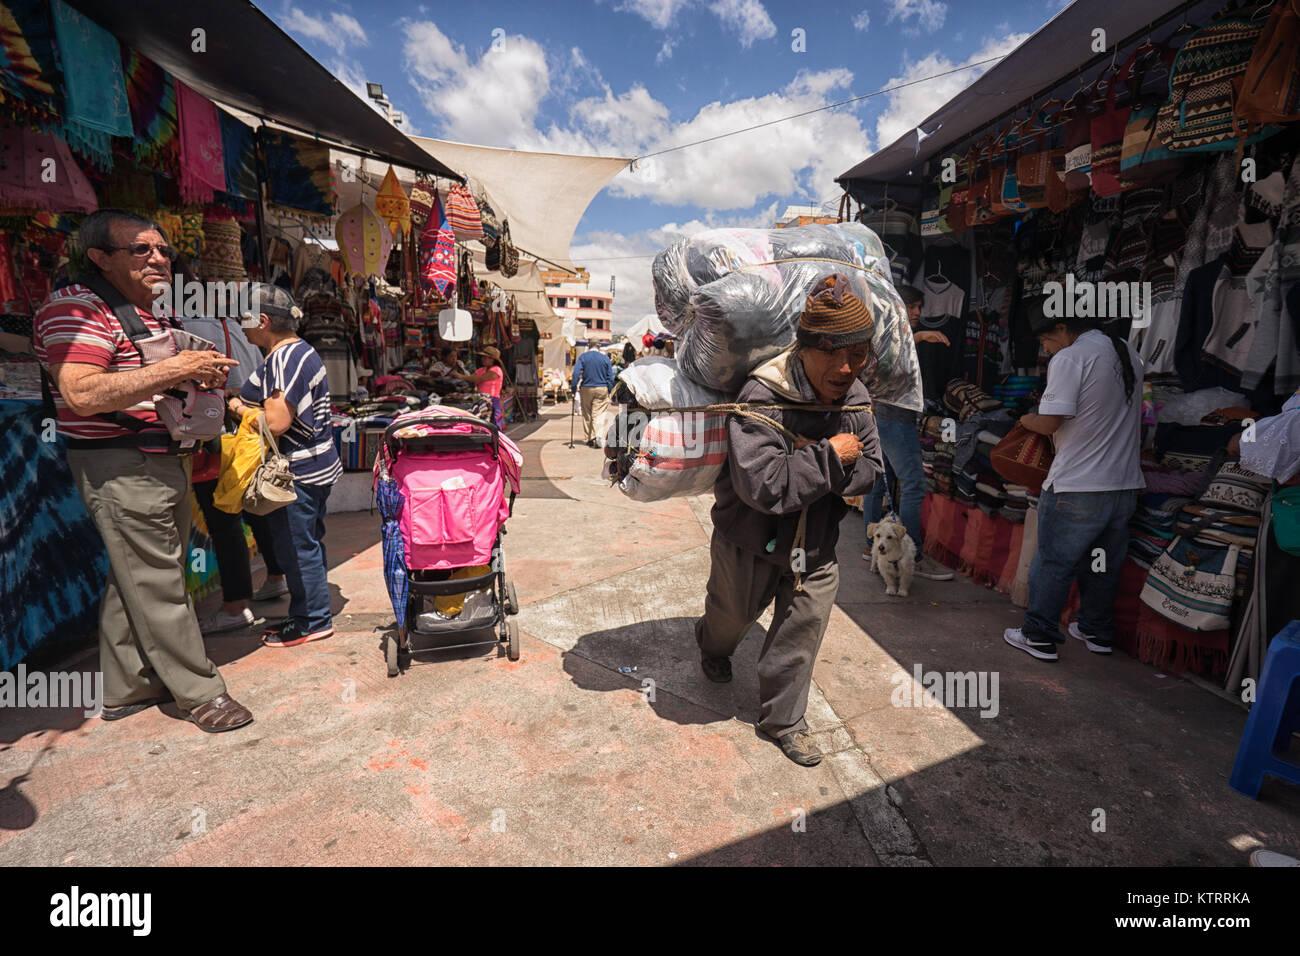 Otavalo, Ecuador-December 23, 2017: local man hauling merchandise through the artisan market on his back - Stock Image